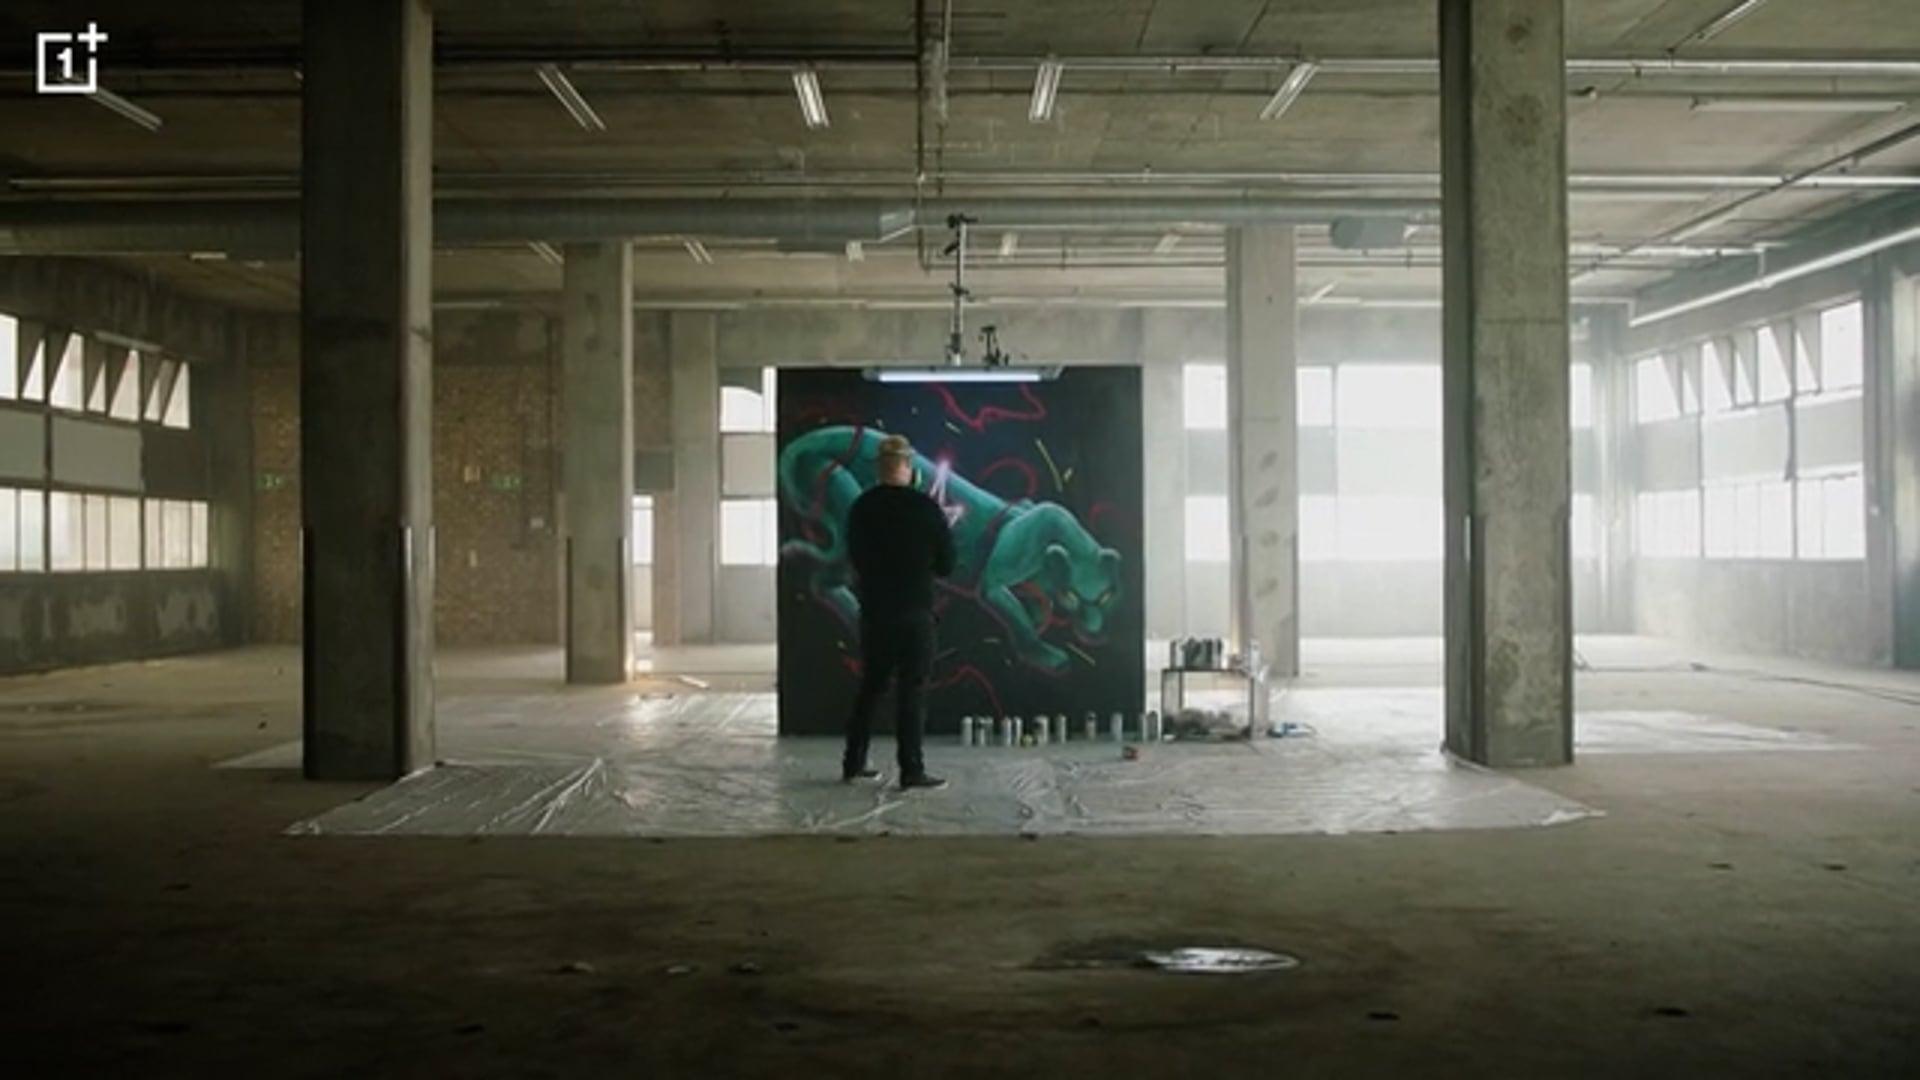 OnePlus - Graffiti